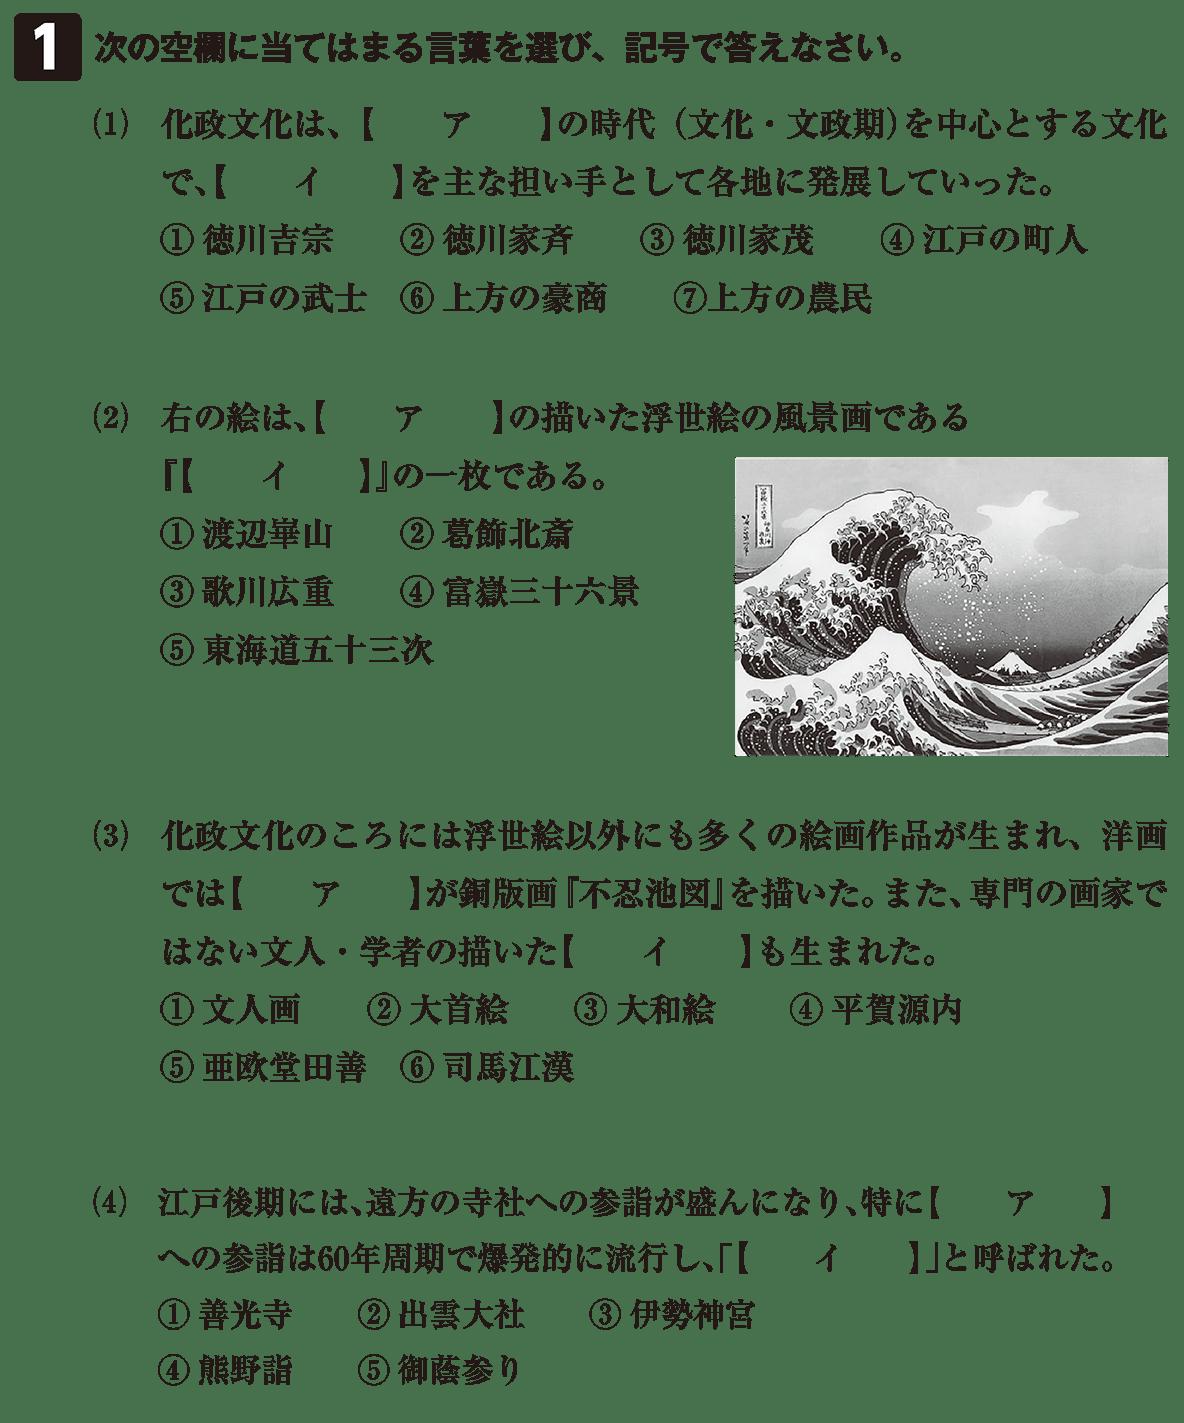 近世の文化15 問題1 問題